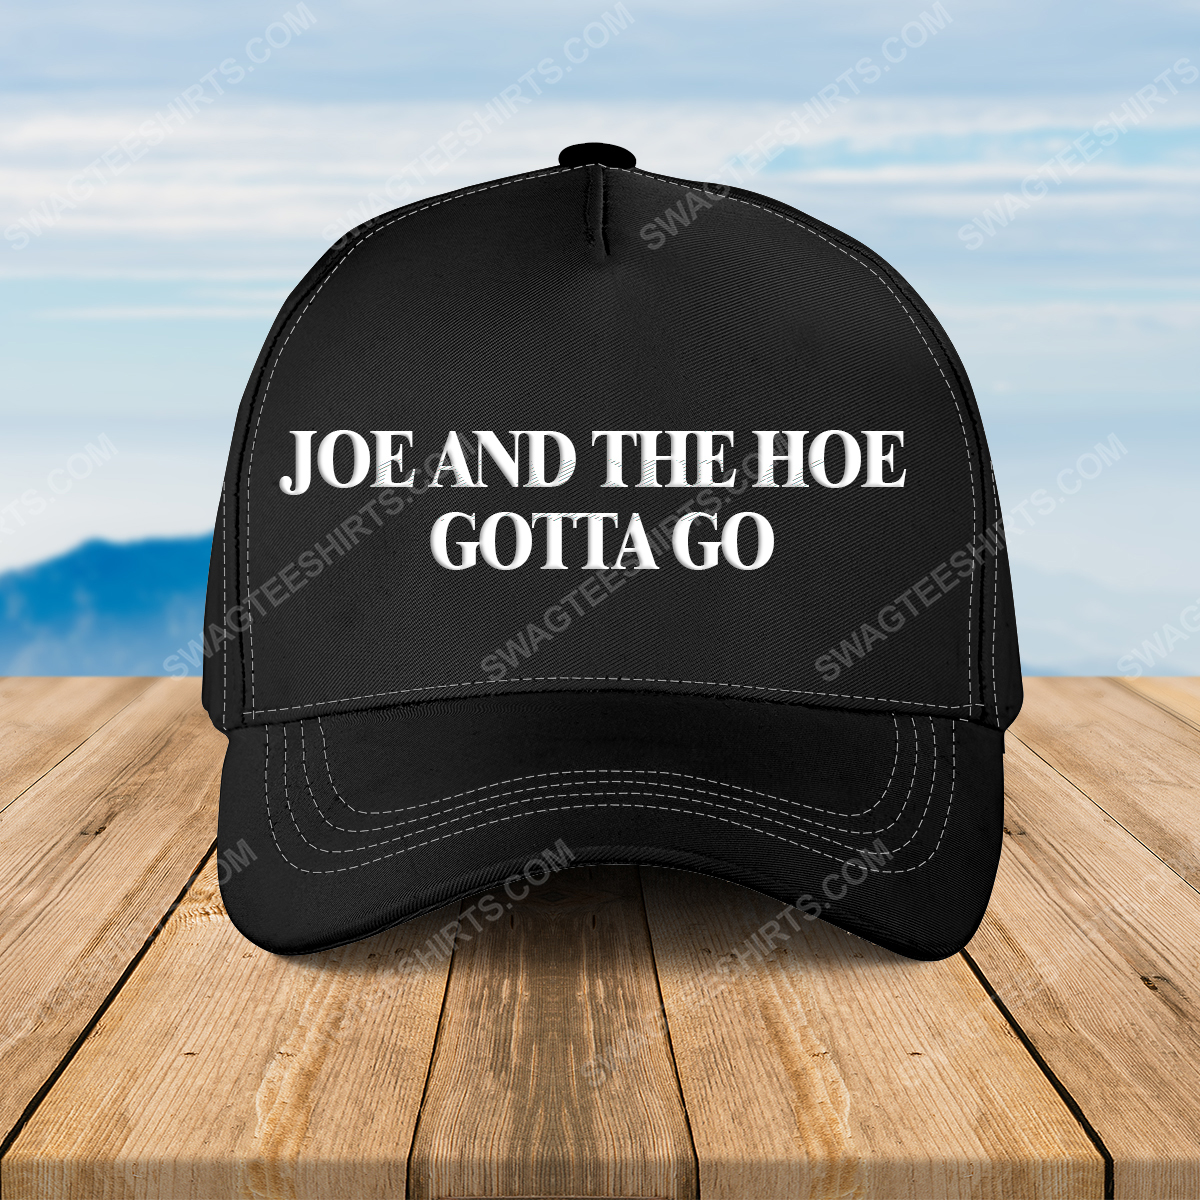 Joe and the hoe gotta go full print classic hat 1